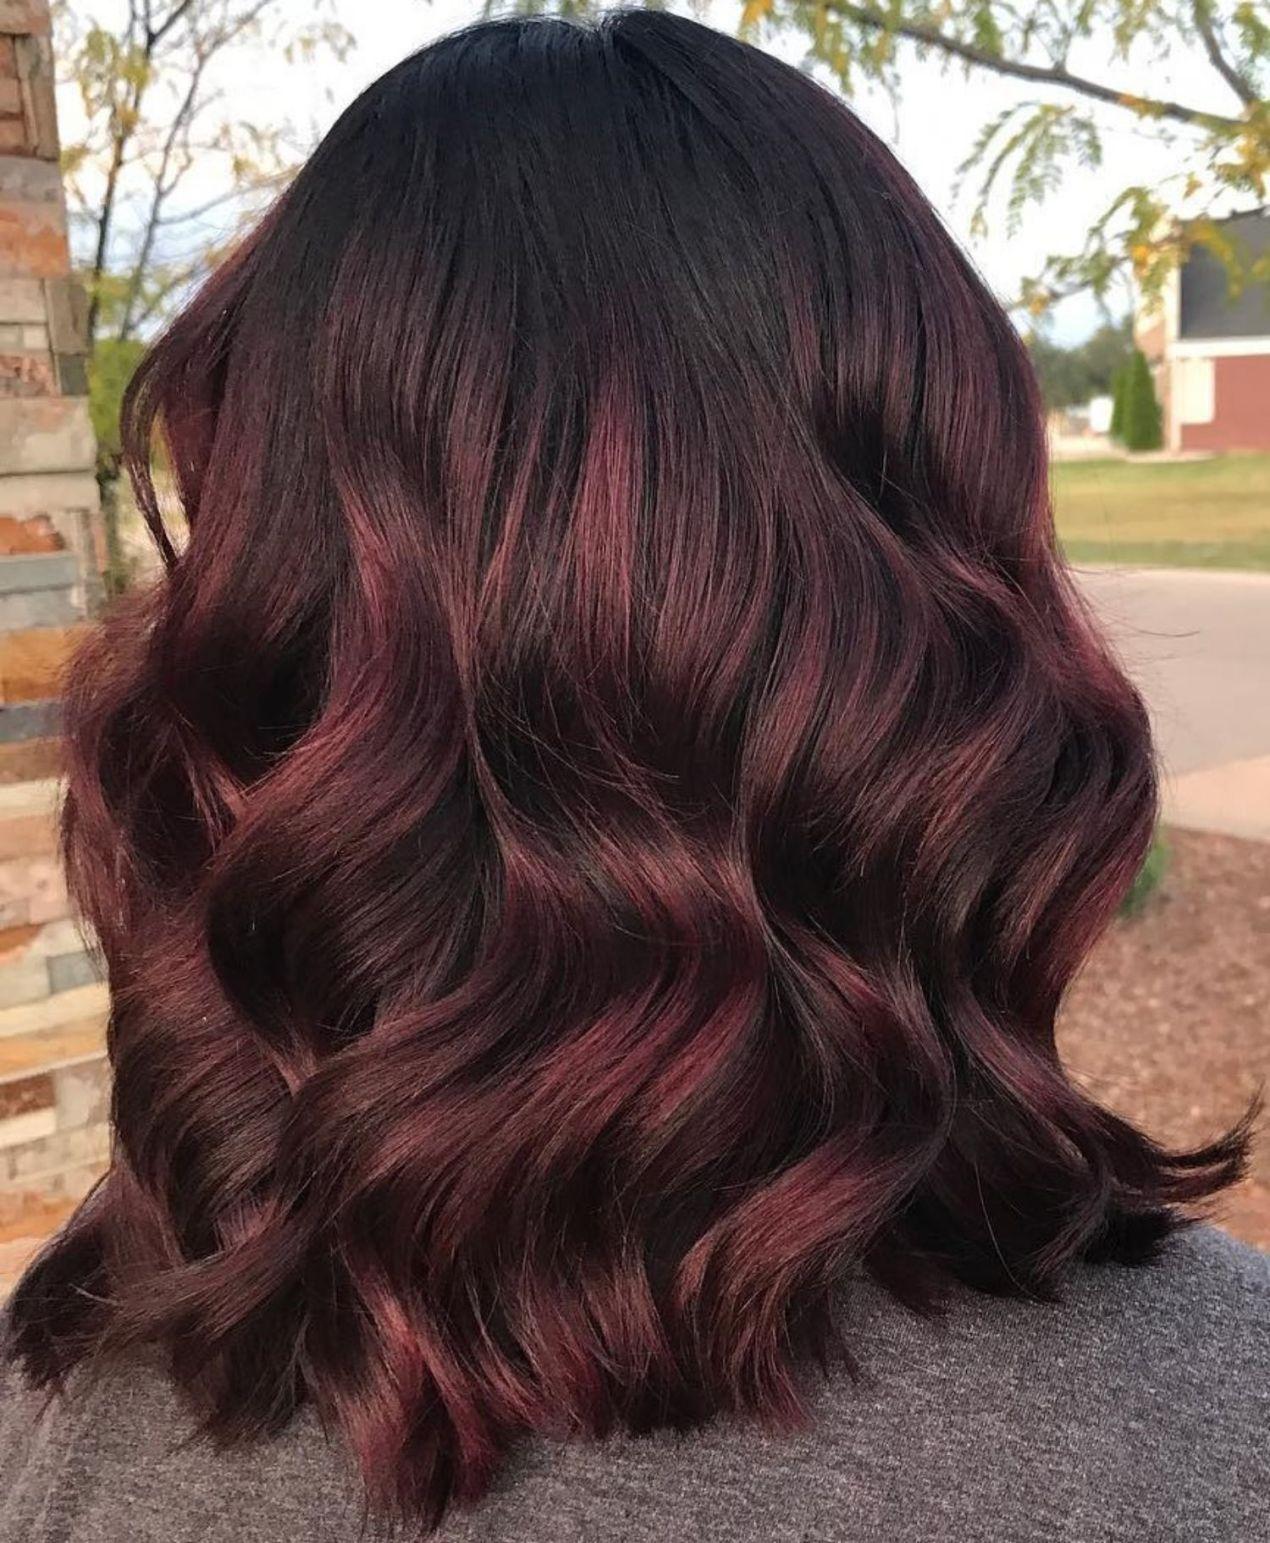 45 Shades Of Burgundy Hair Dark Burgundy Maroon Burgundy With Red Purple And Brown Highlights Burgundy Balayage Hair Color Auburn Red Balayage Hair